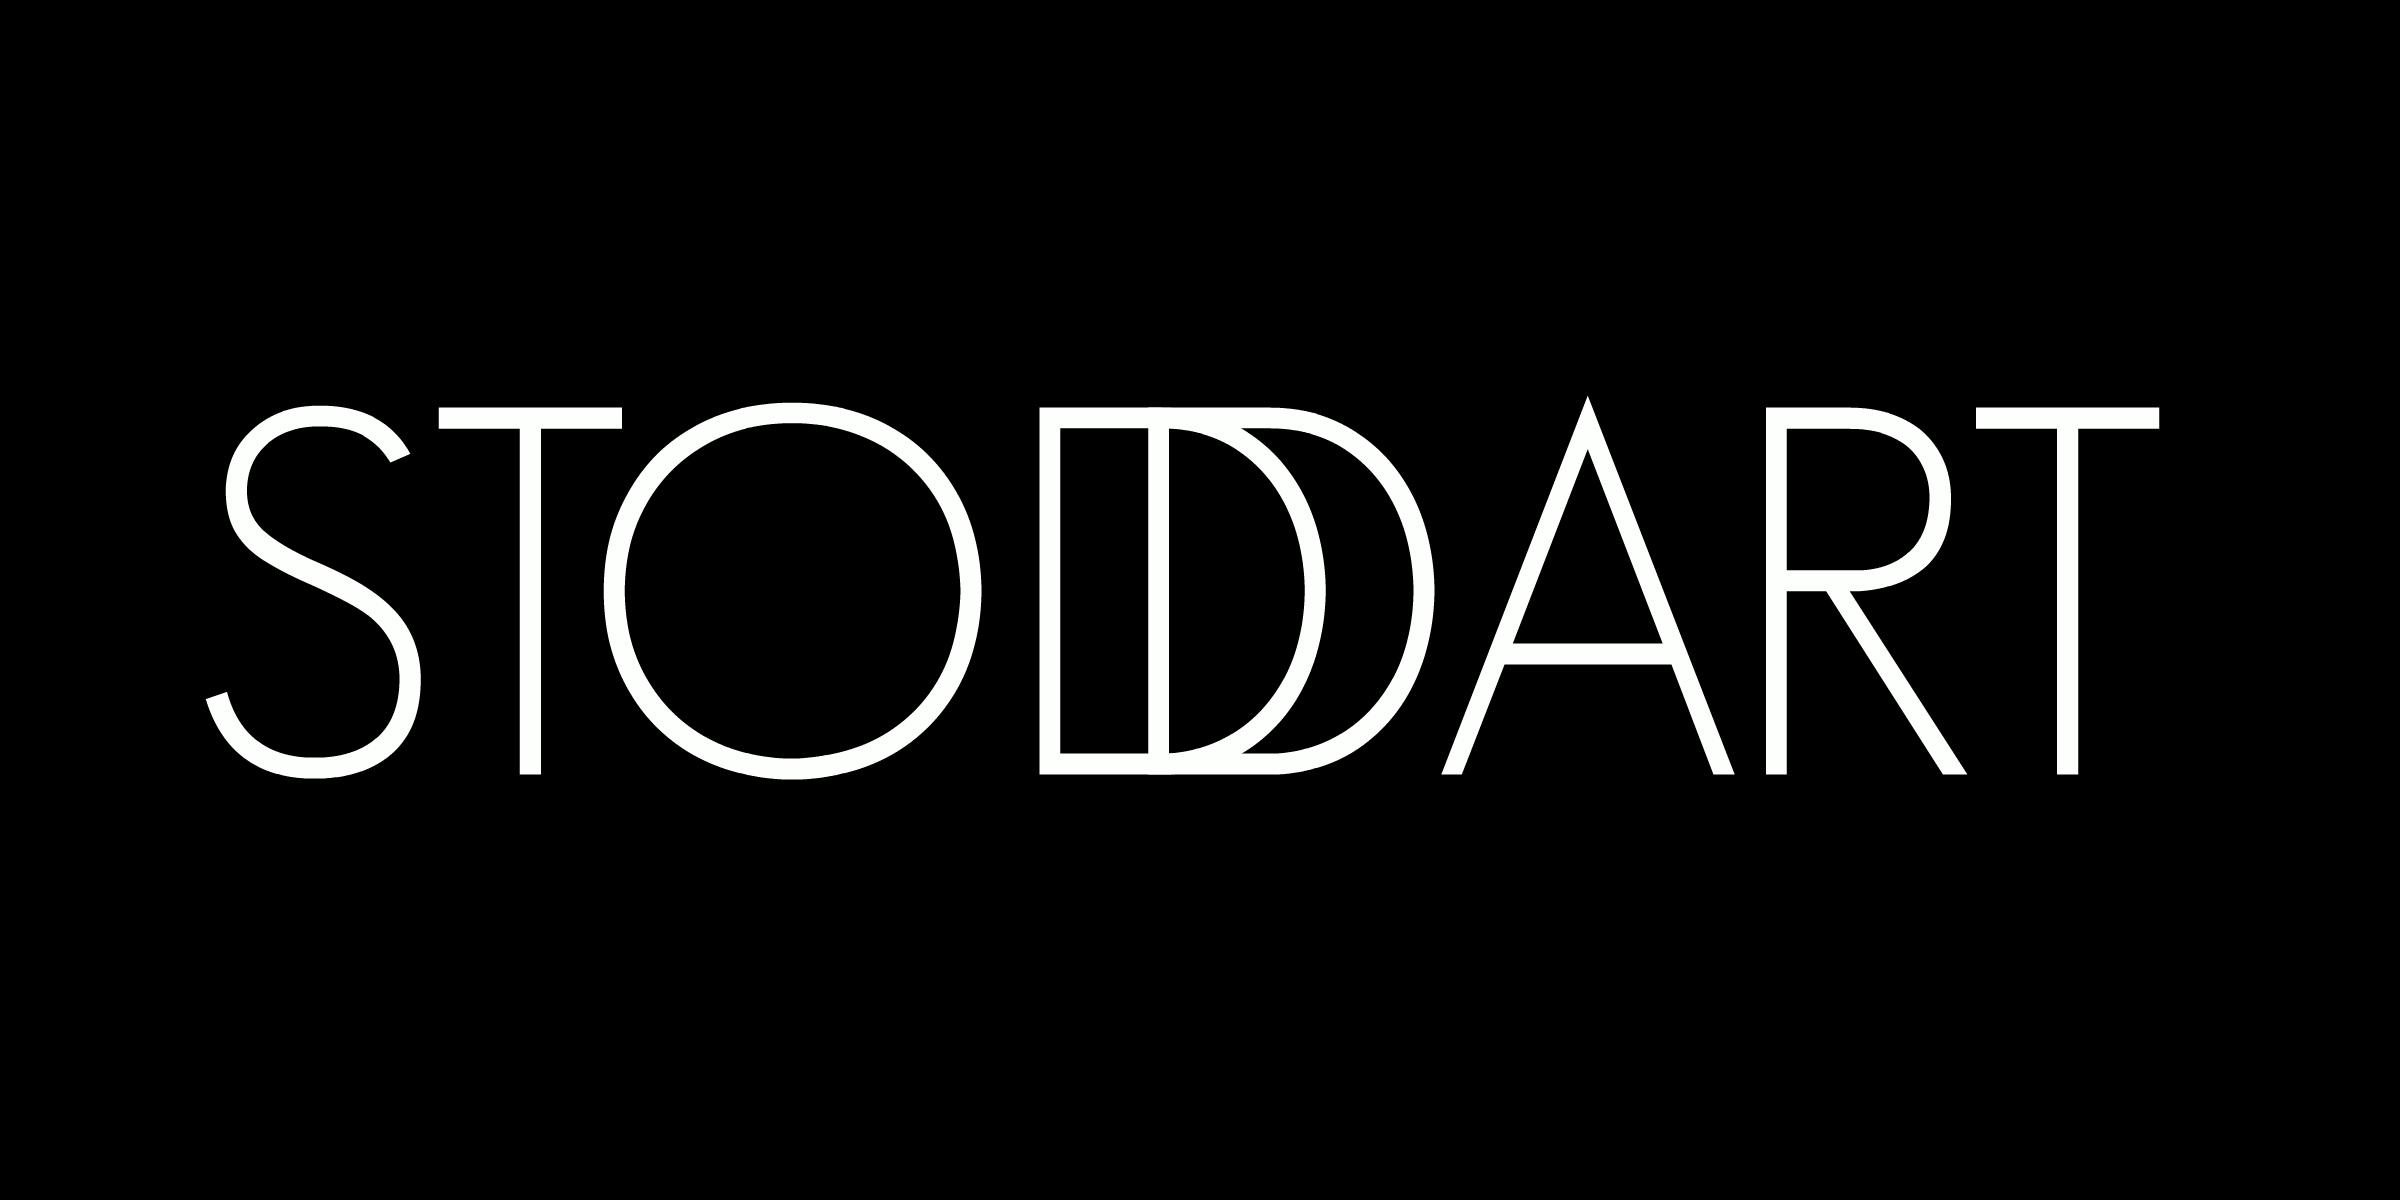 Stoddart Black